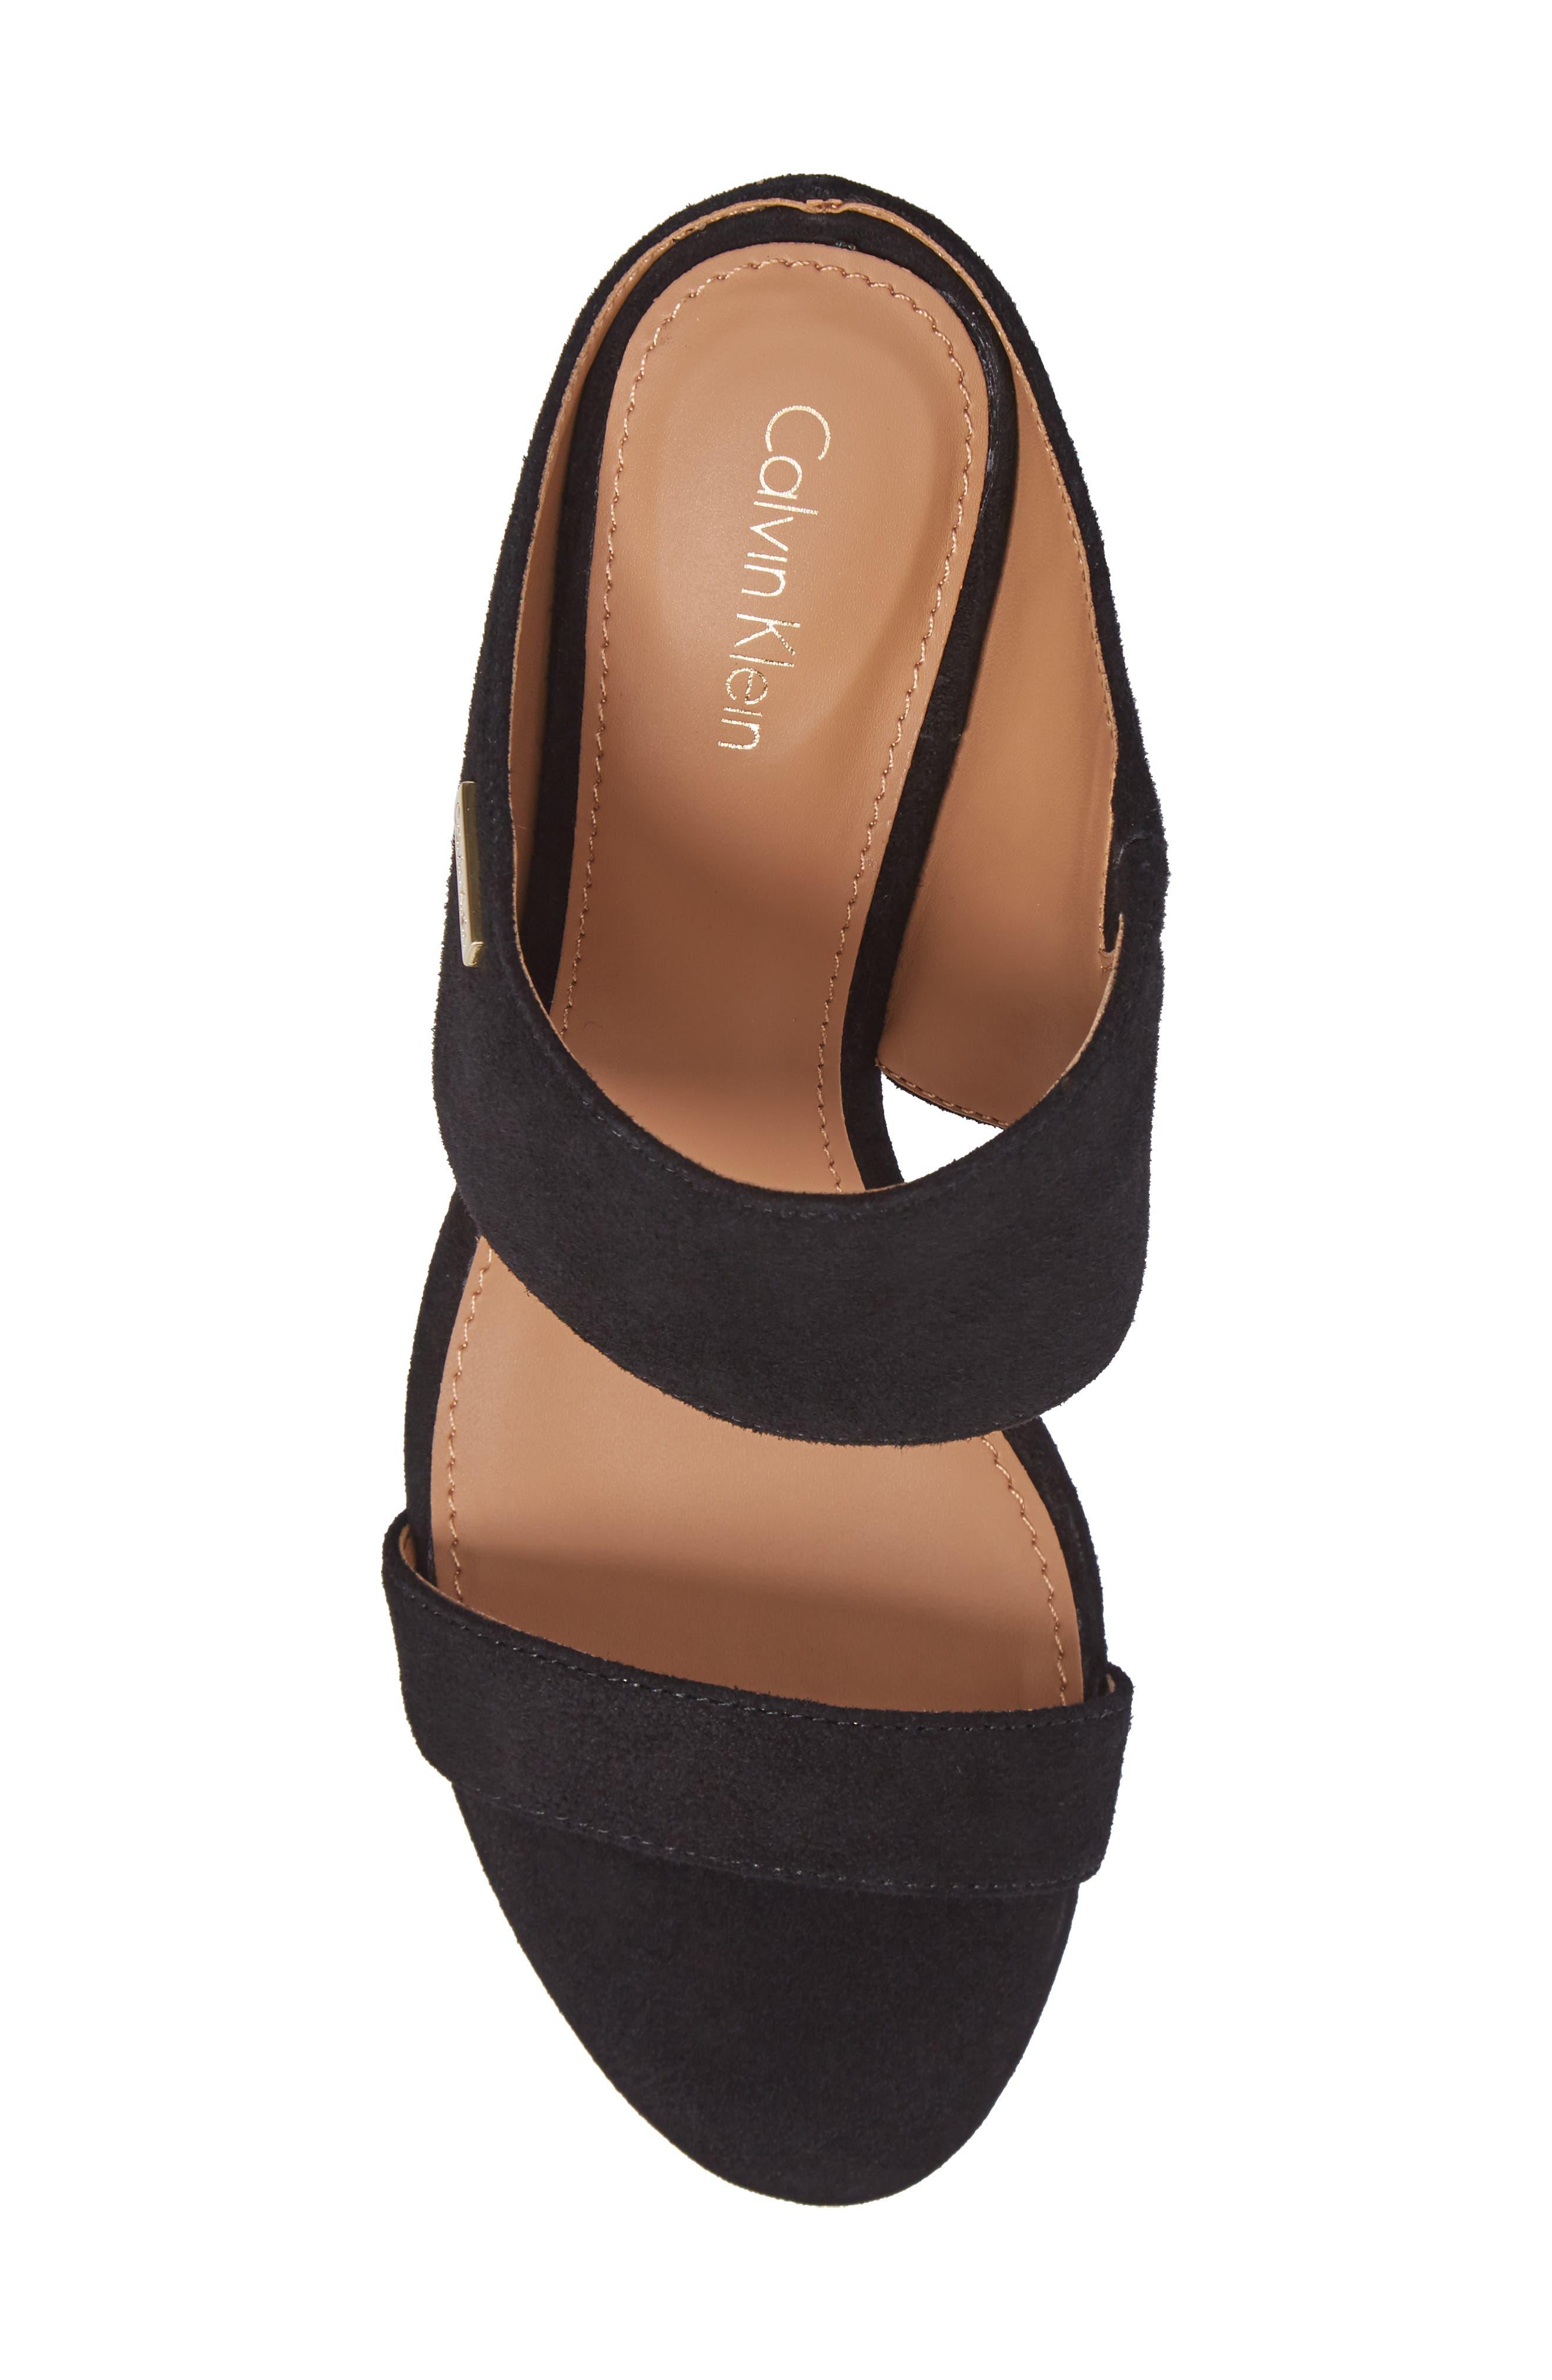 Phyllis Studded Wedge Sandal,                             Alternate thumbnail 17, color,